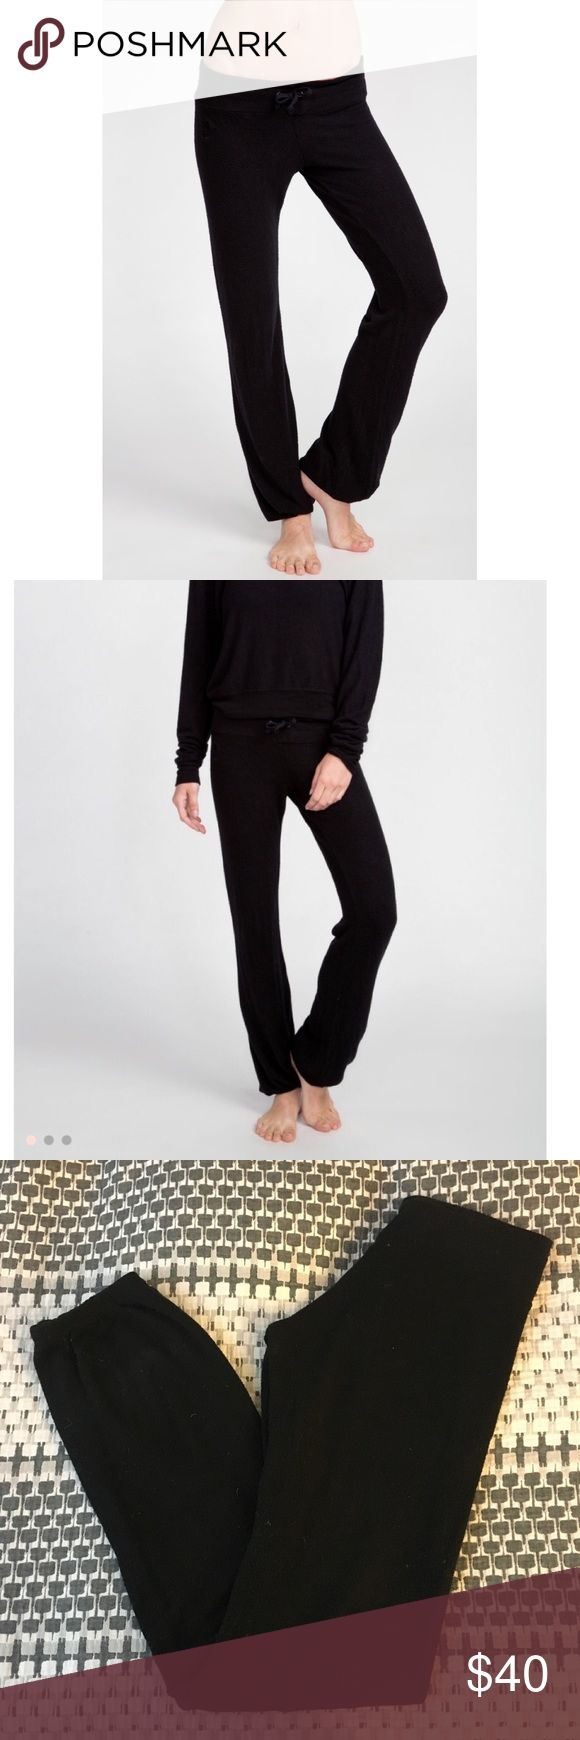 Wildfox Malibu Sweatpants Malibu Skinny Sweats from Wildfox's Essentials collection. 47% rayon, 47% polyester, 6% spandex. Wildfox Pants